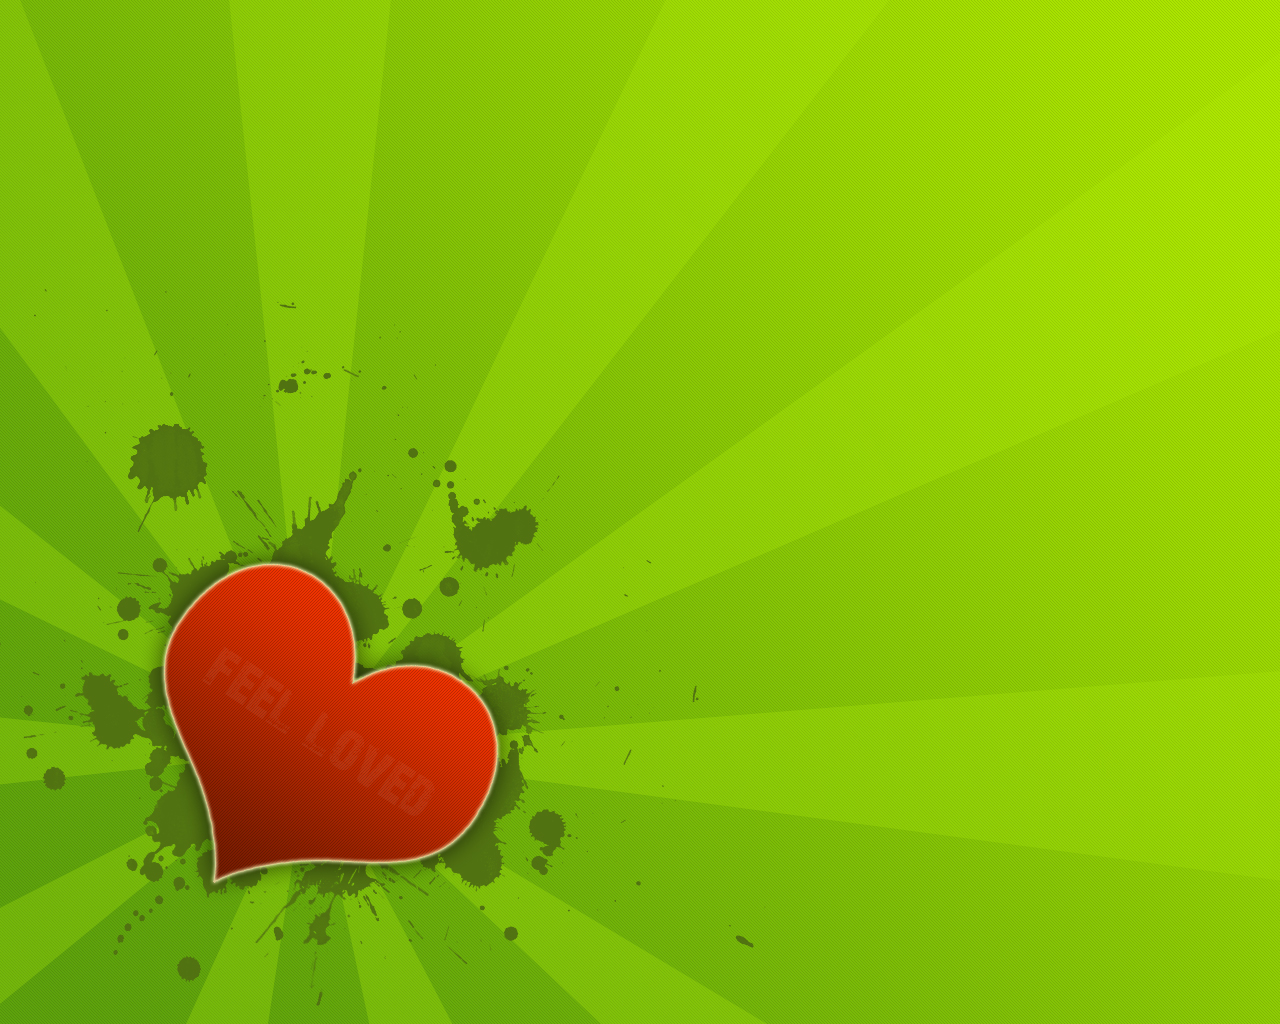 Hd 3d Wallpapers For Pc Full Screen Free Download Amor Fondos De Pantalla De Amor Wallpapers Para